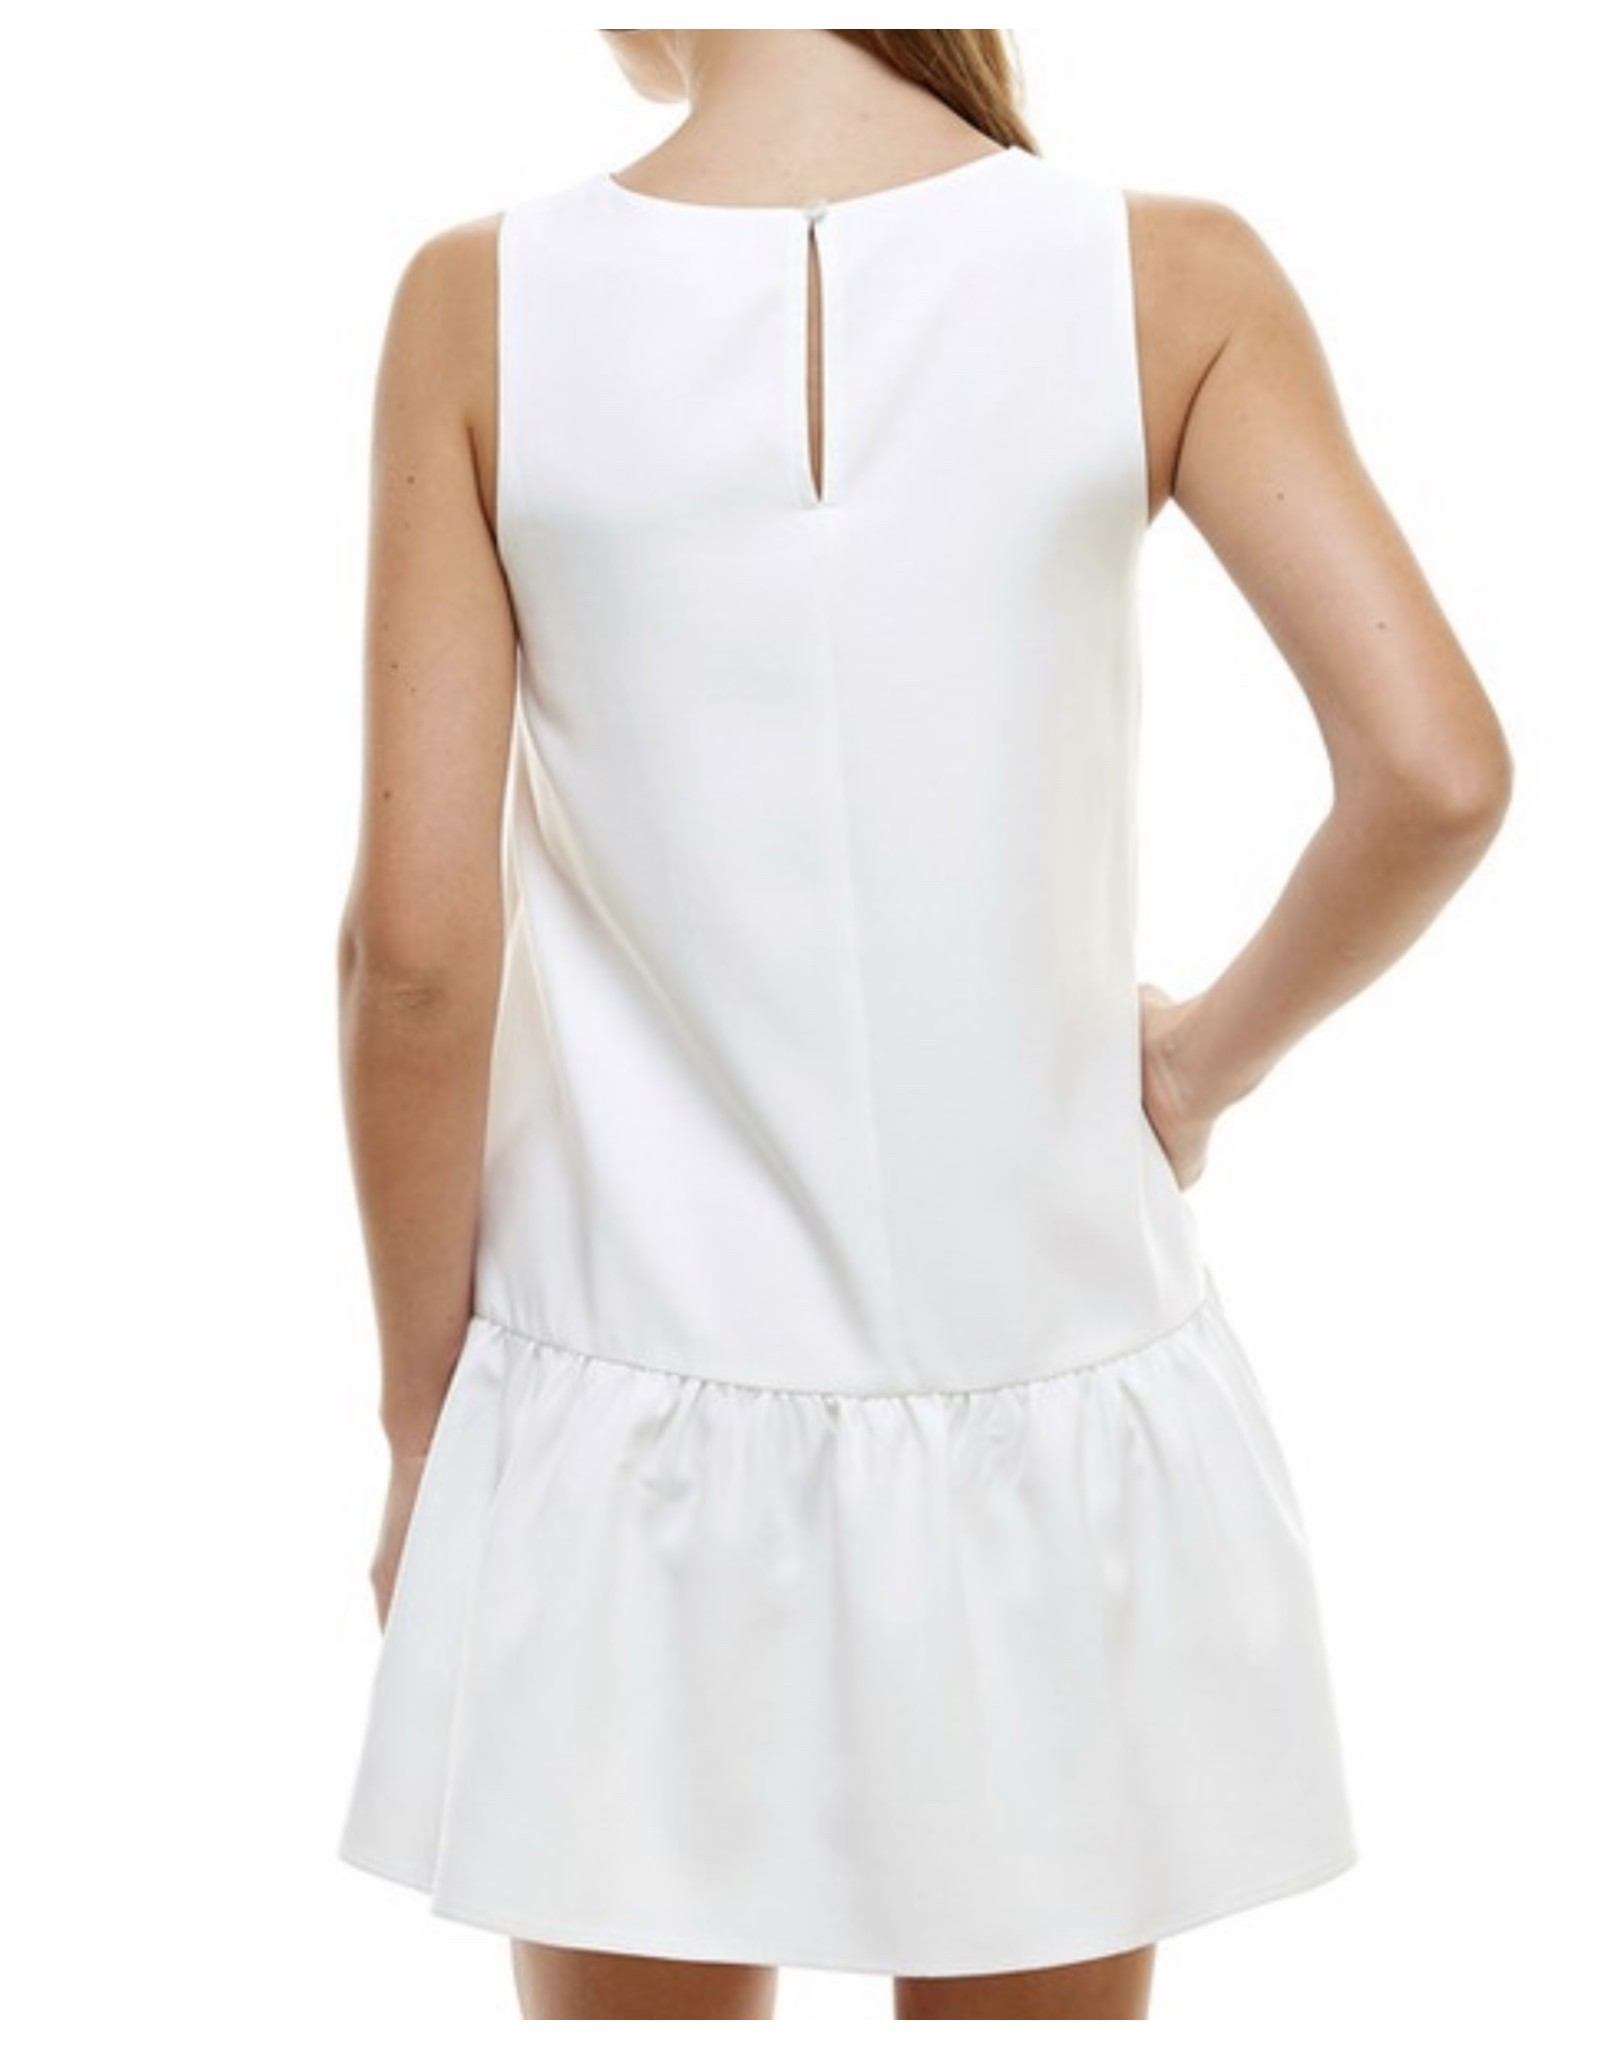 Ruffle Detail Dress - White